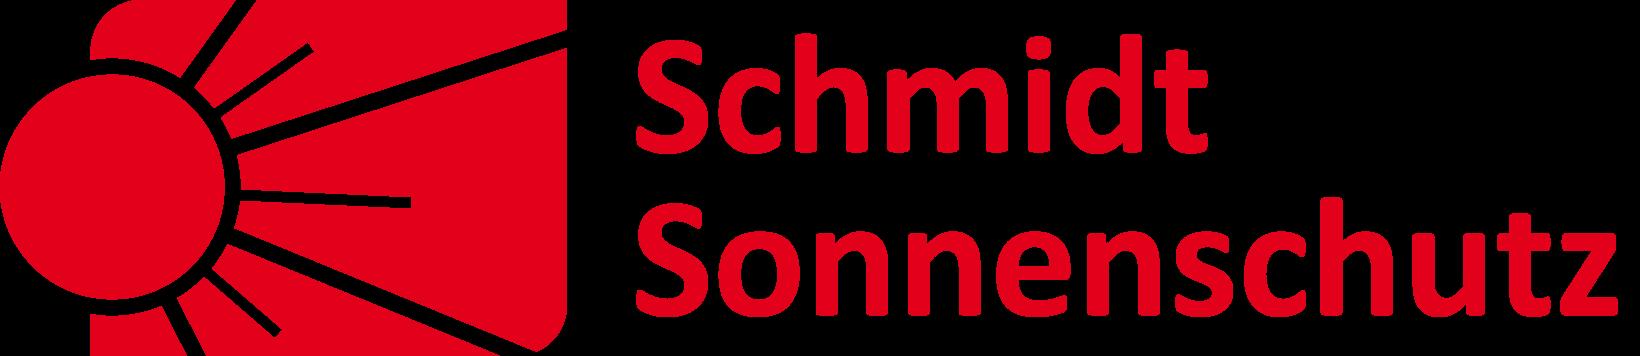 Schmidt Sonnenschutz